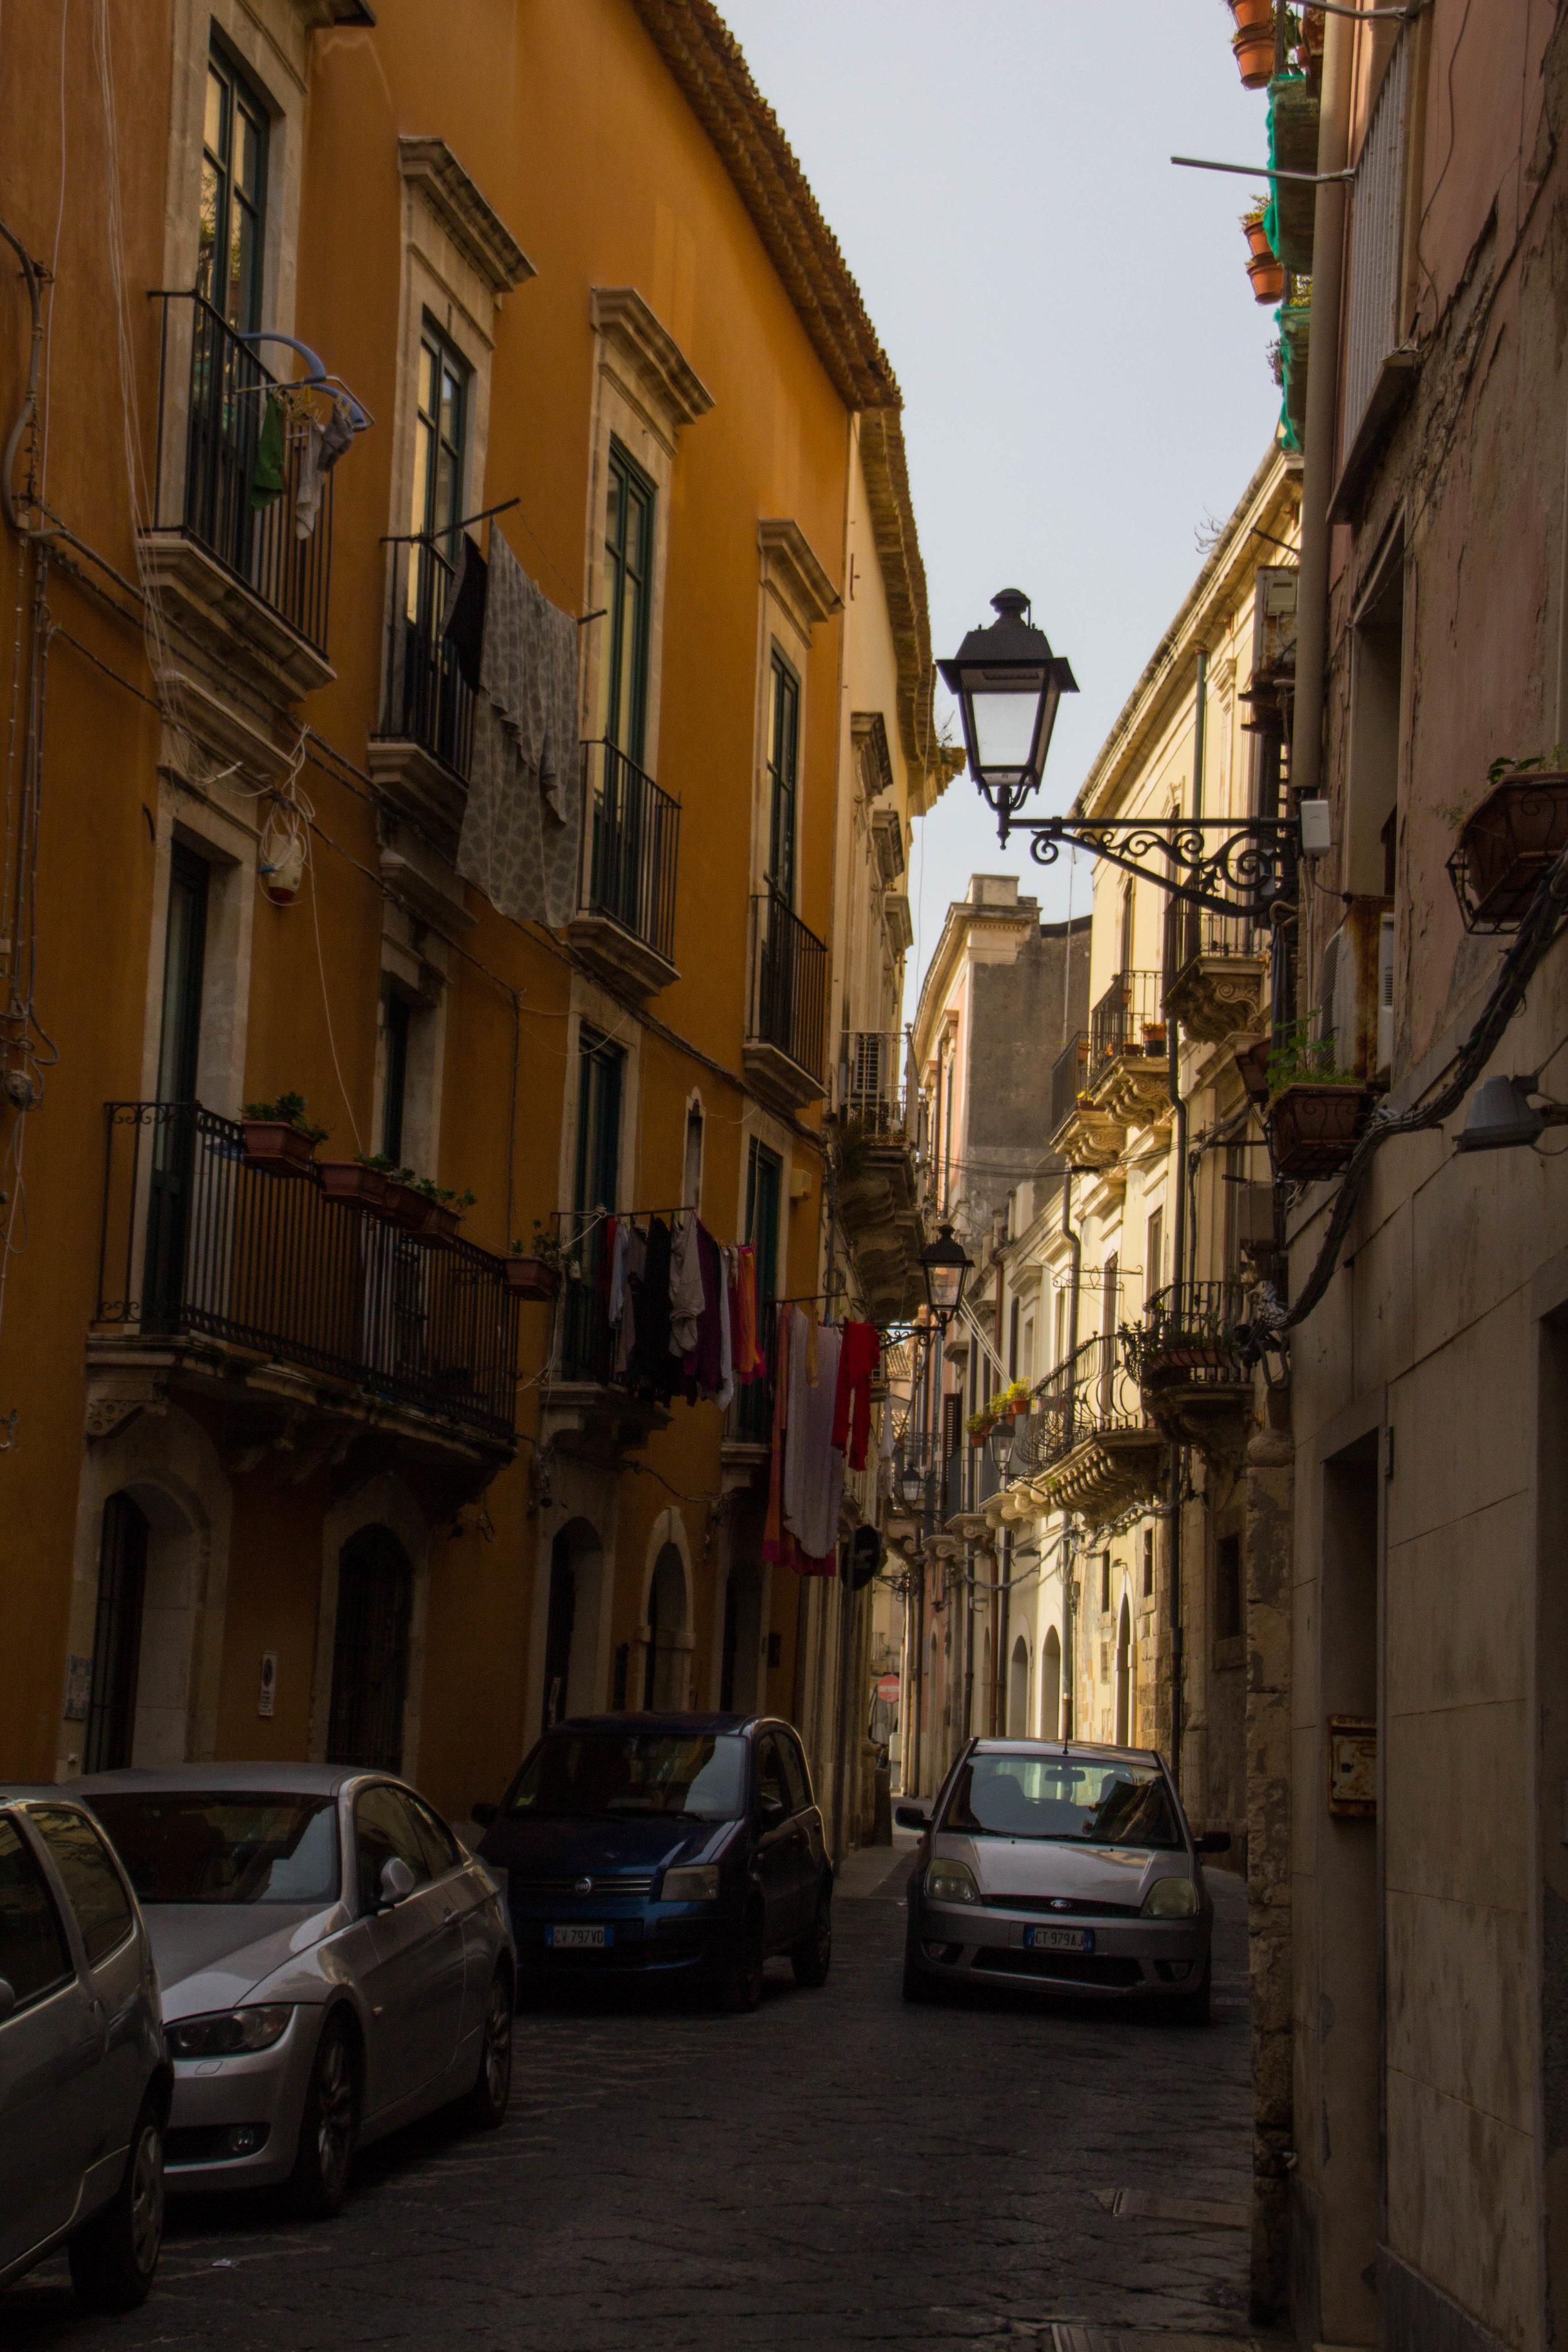 streets-ortygia-syracuse-sicily-36.jpg